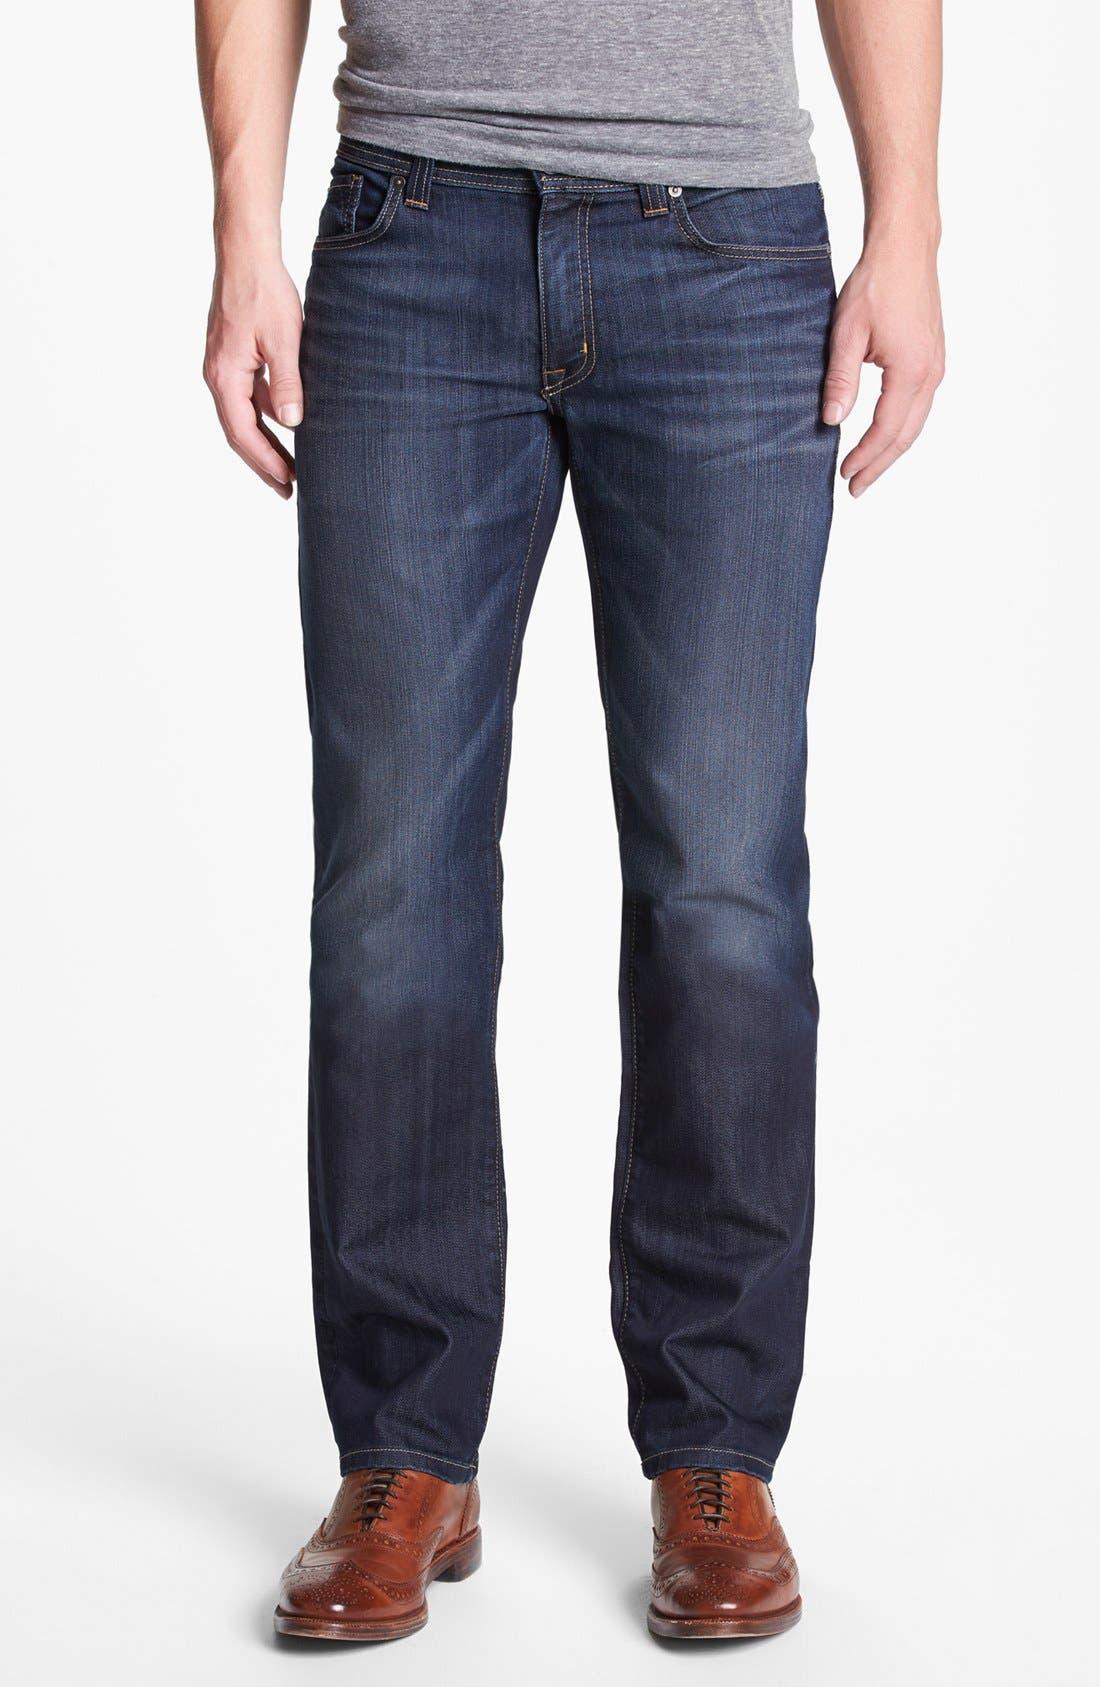 Alternate Image 1 Selected - Fidelity Denim 'Slim Jim' Slim Fit Jeans (Trigger Dark) (Tall)